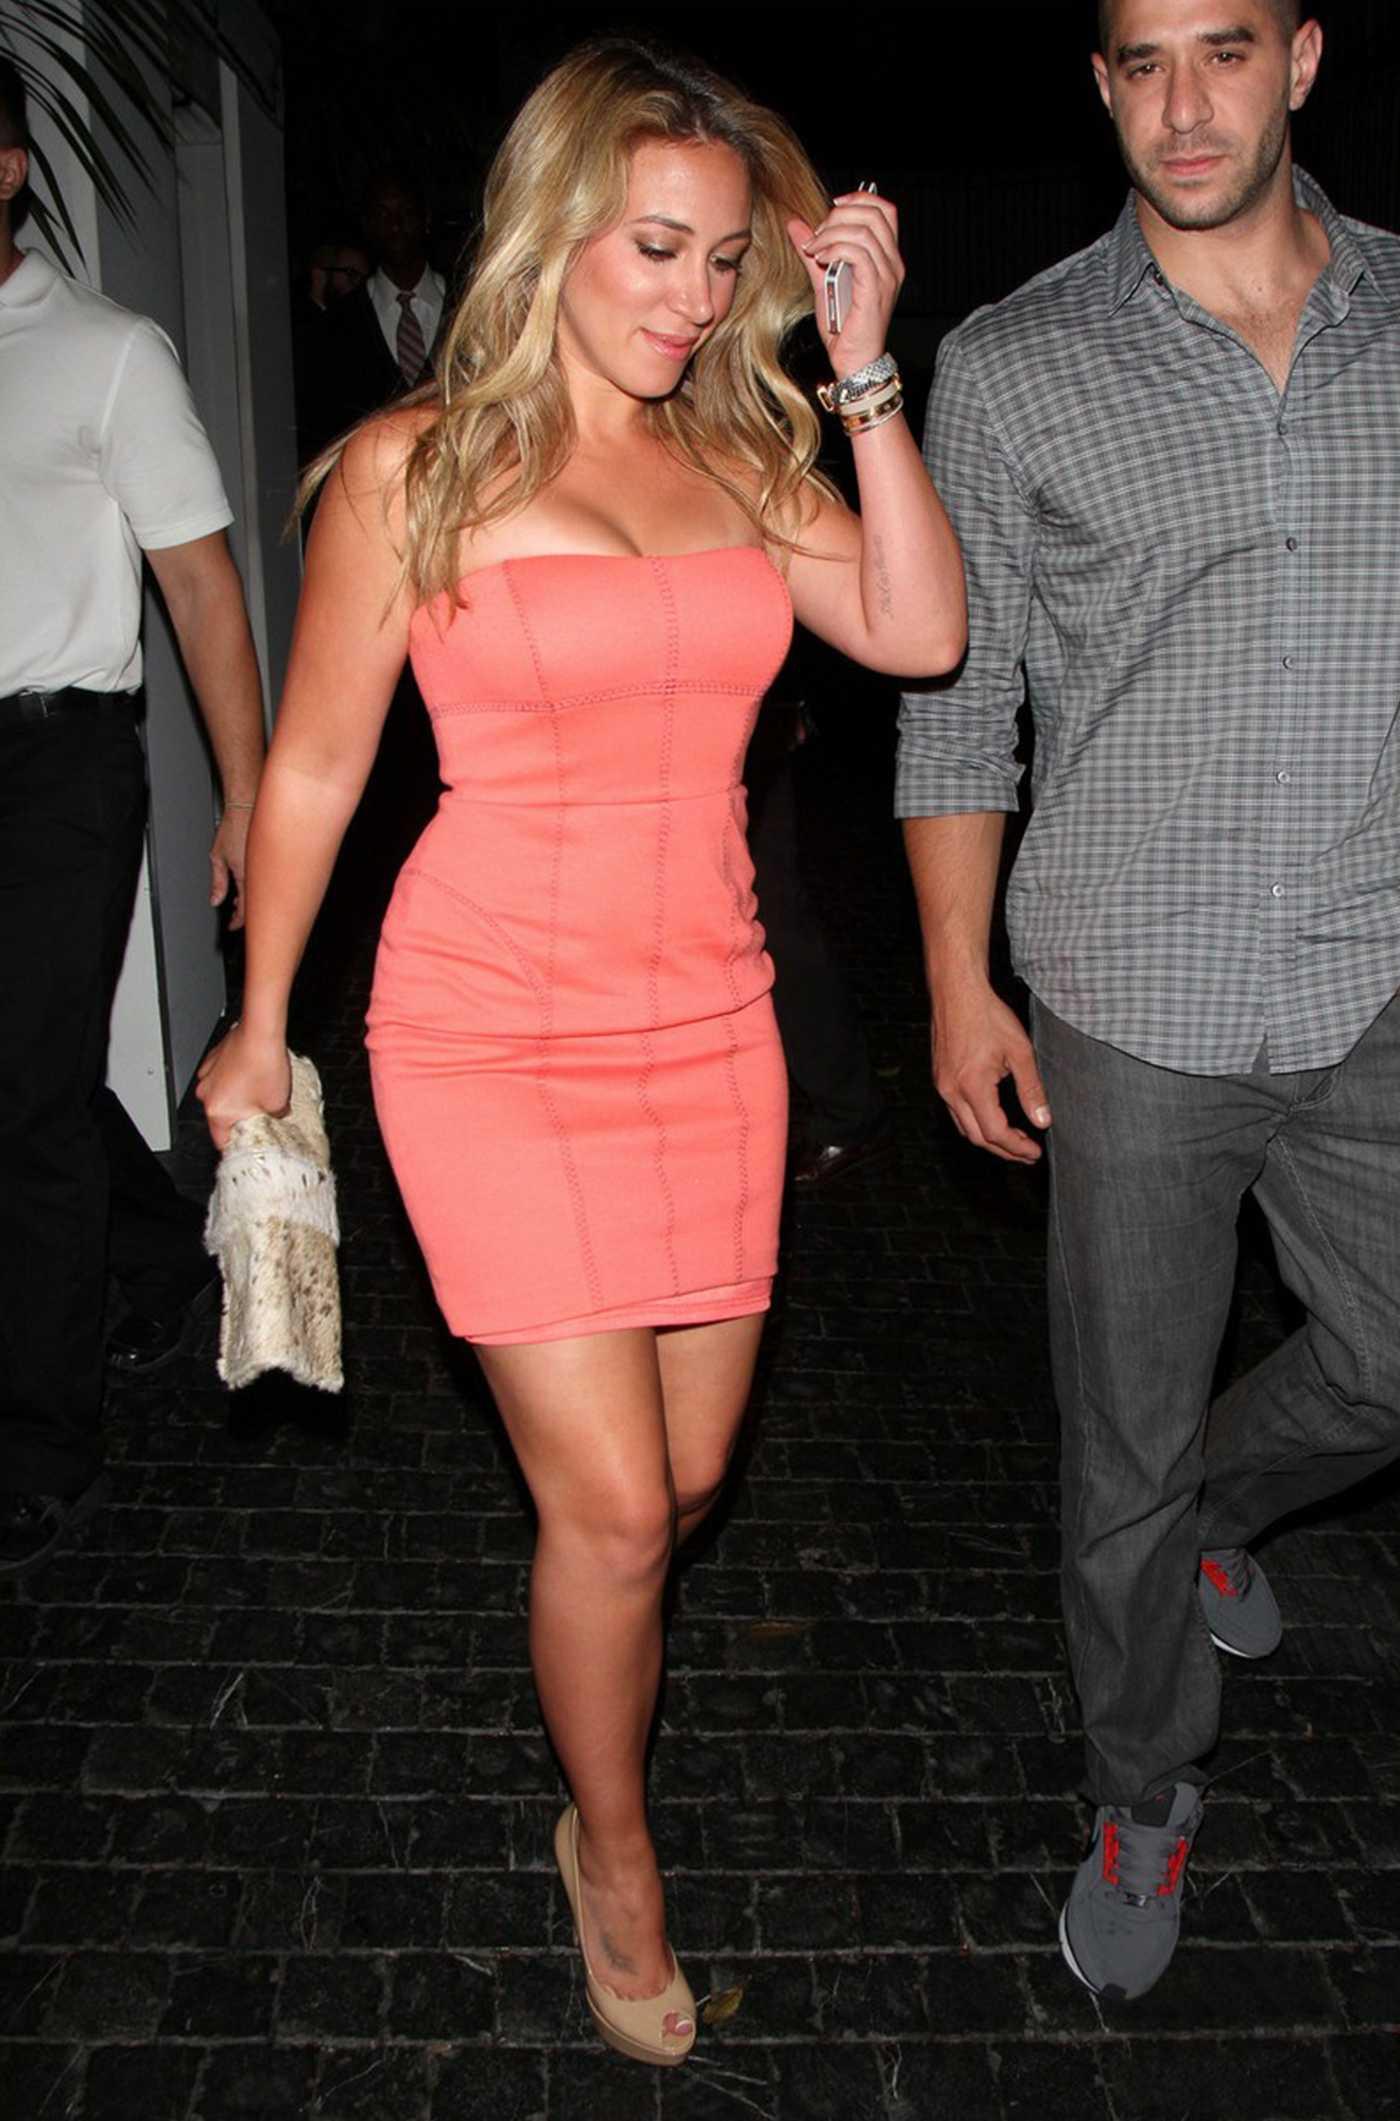 Haylie Duff Wear Short Dress in West Hollywood